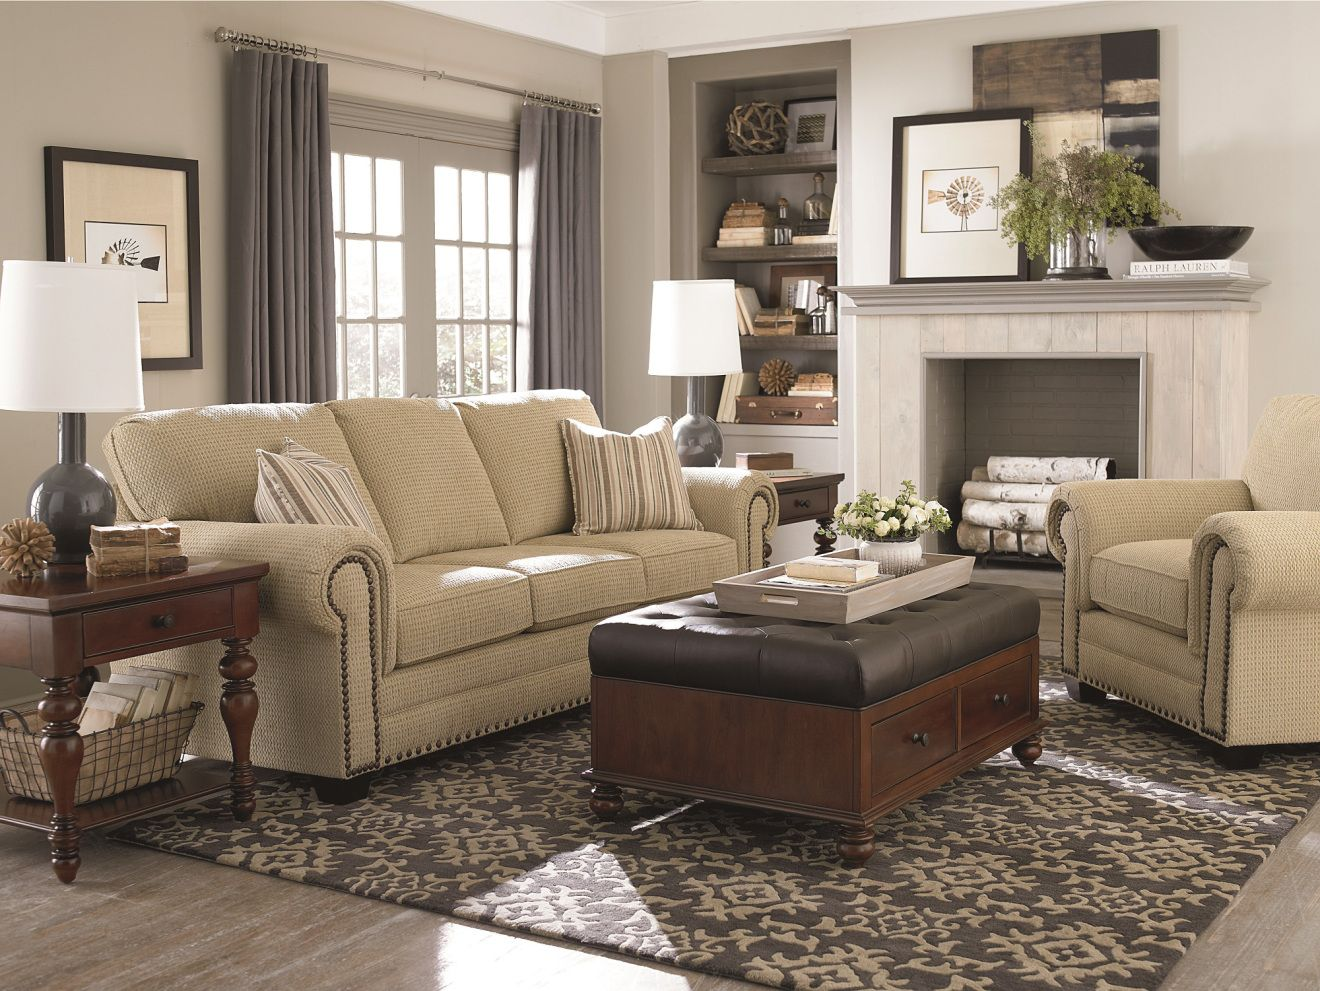 Best Bassett Furniture Quality Reviews With Bassett Furniture